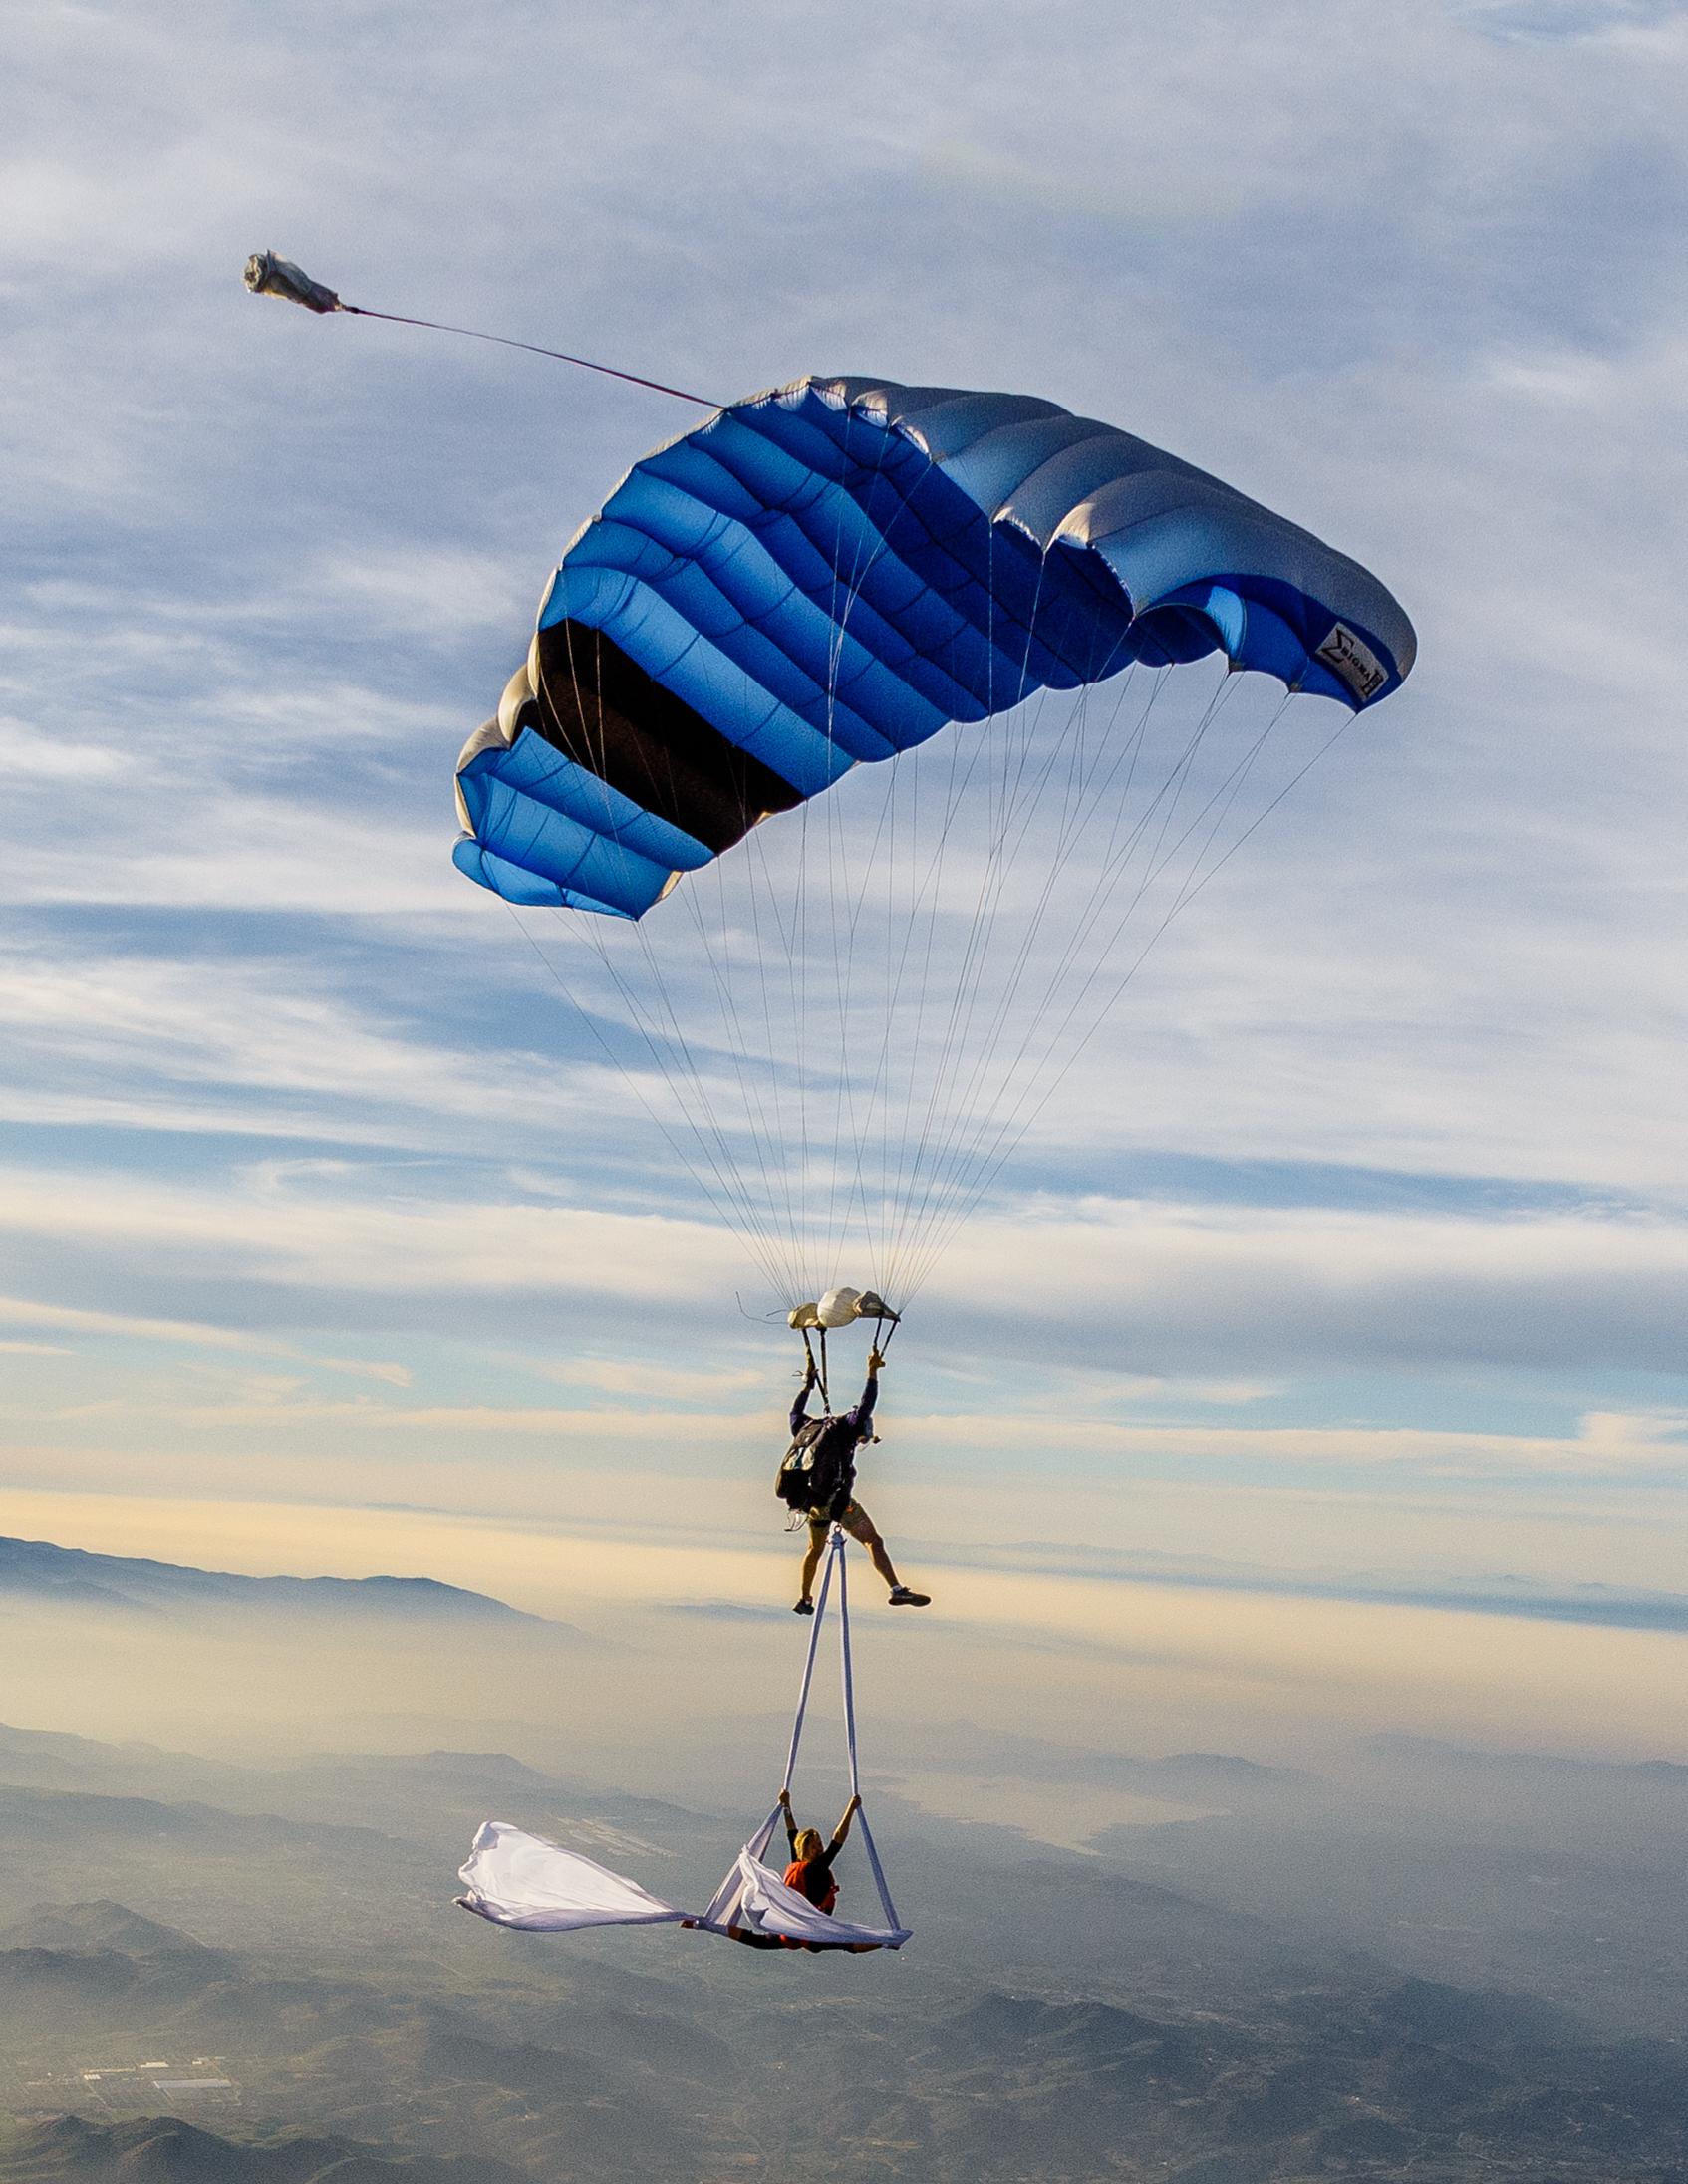 aerialessentialsspons